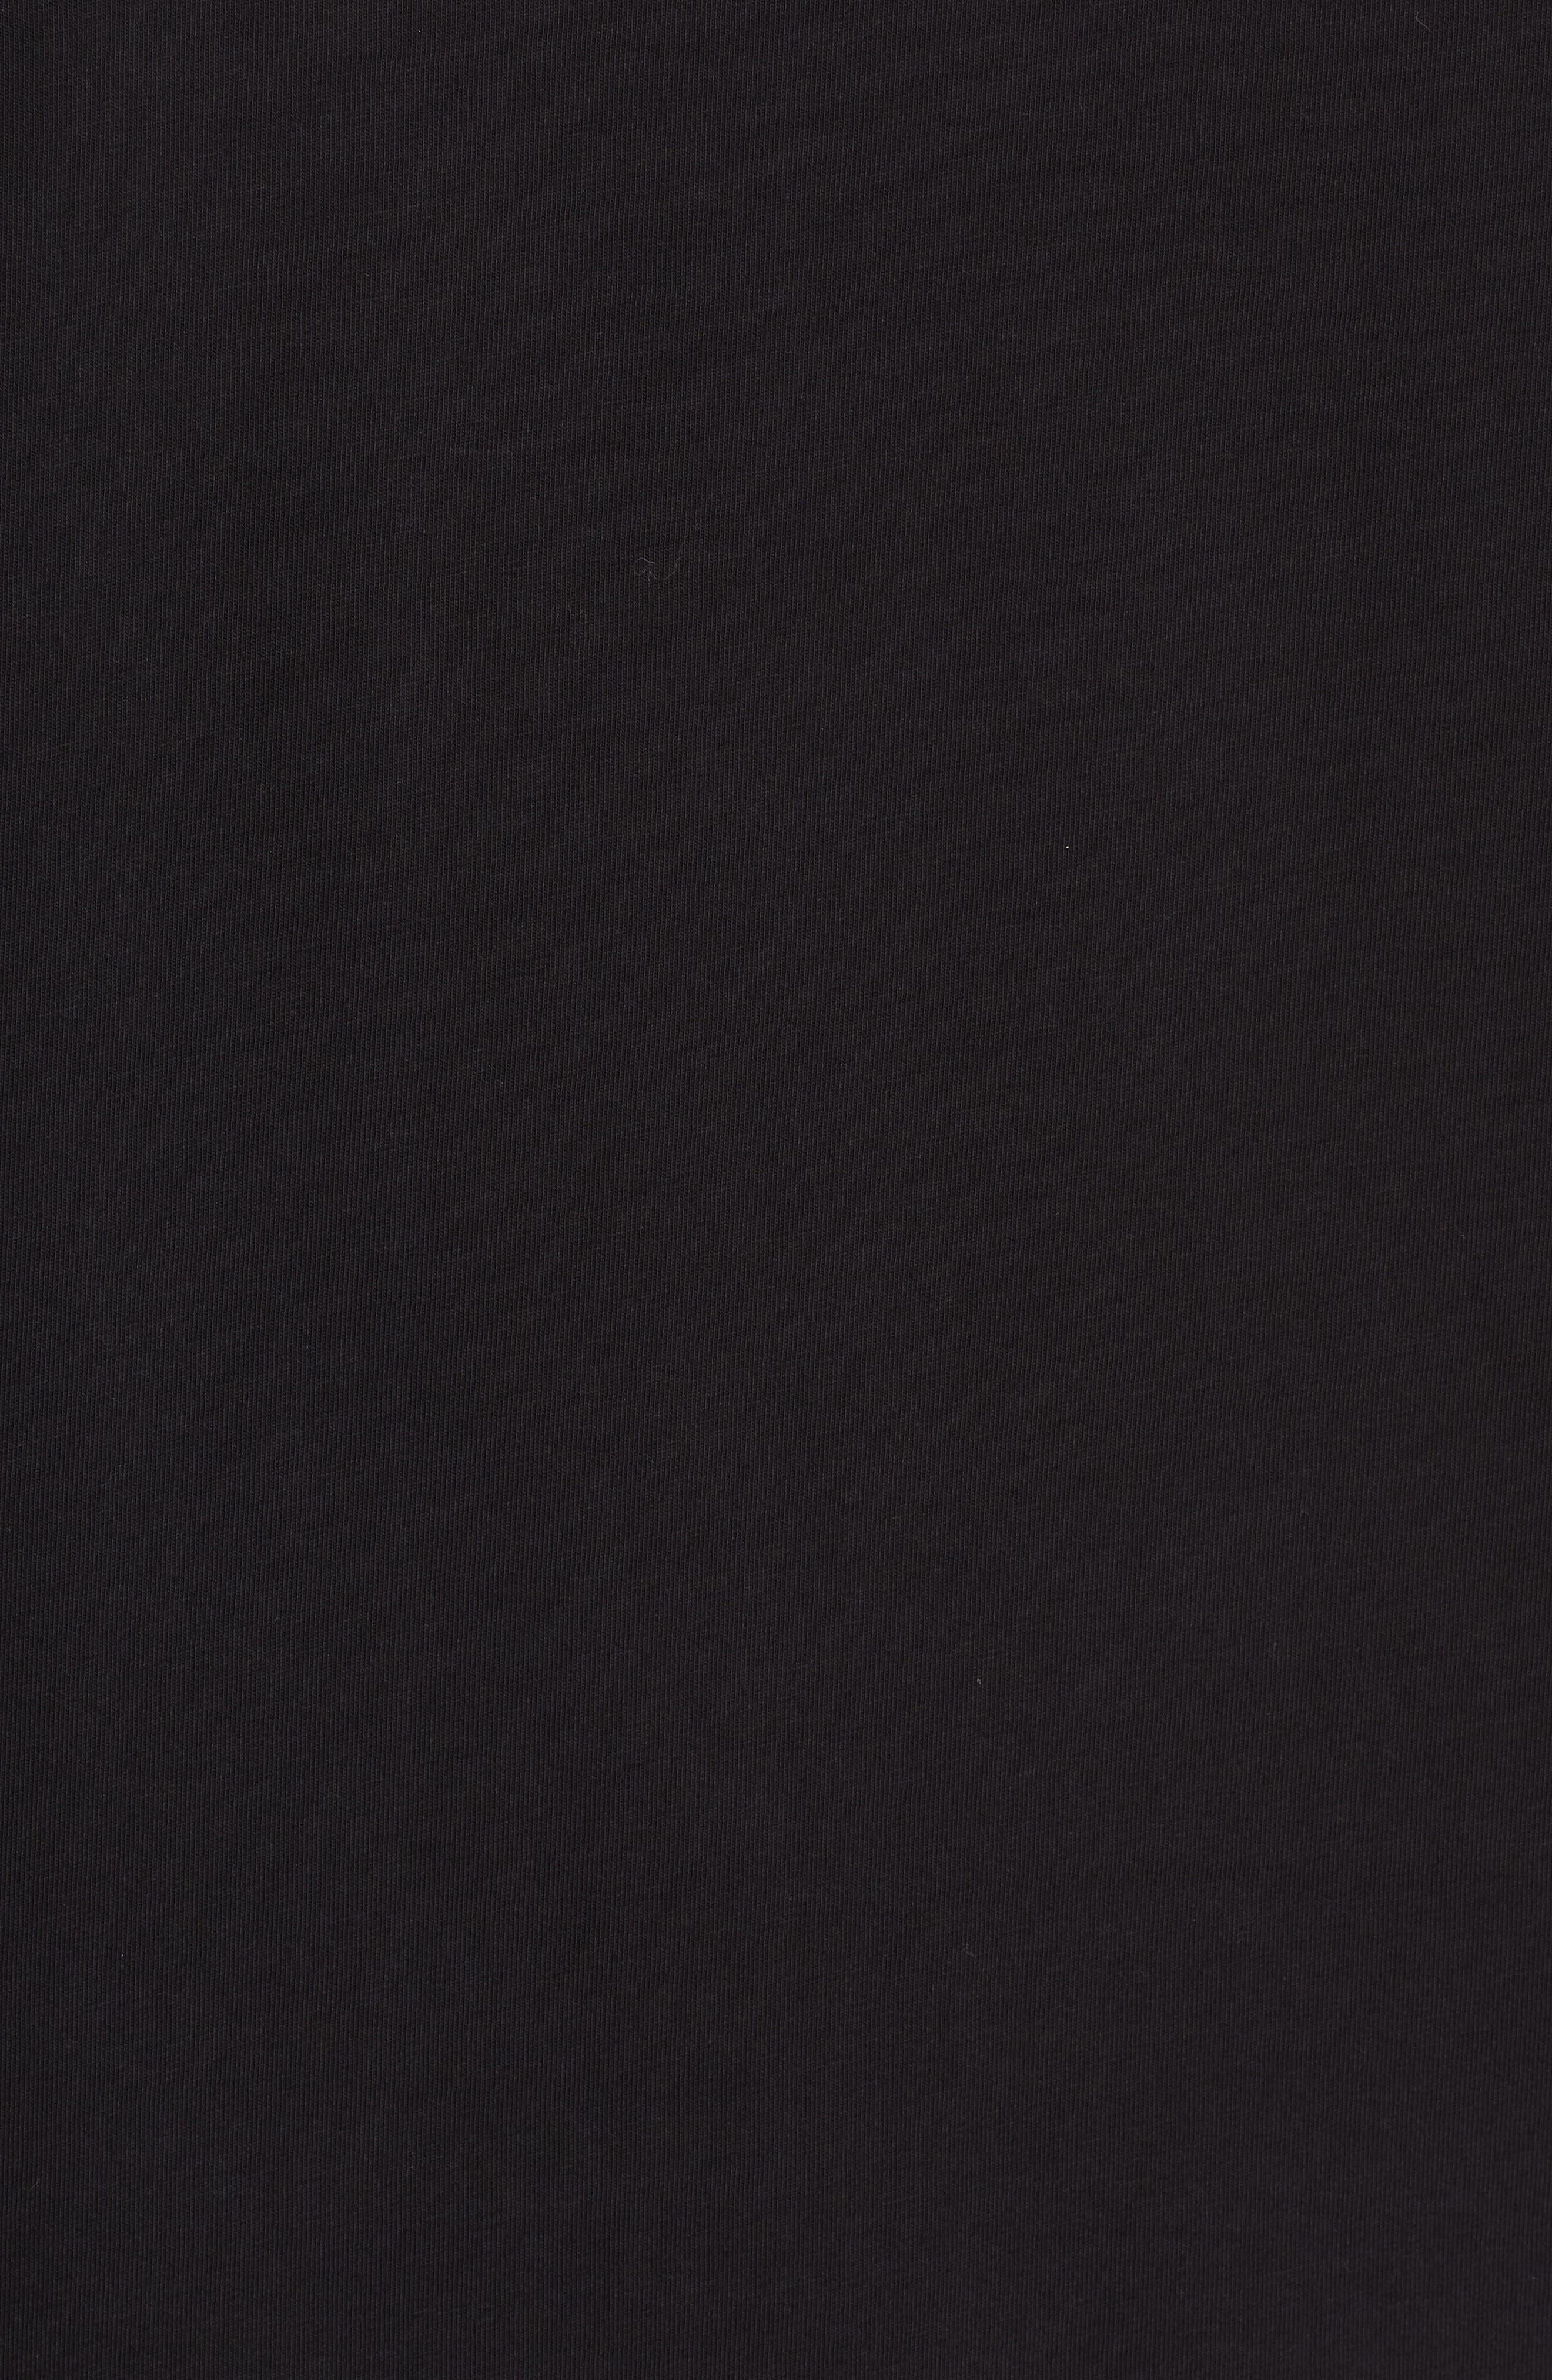 VERSACE COLLECTION,                             Half Medusa T-Shirt,                             Alternate thumbnail 5, color,                             BLACK